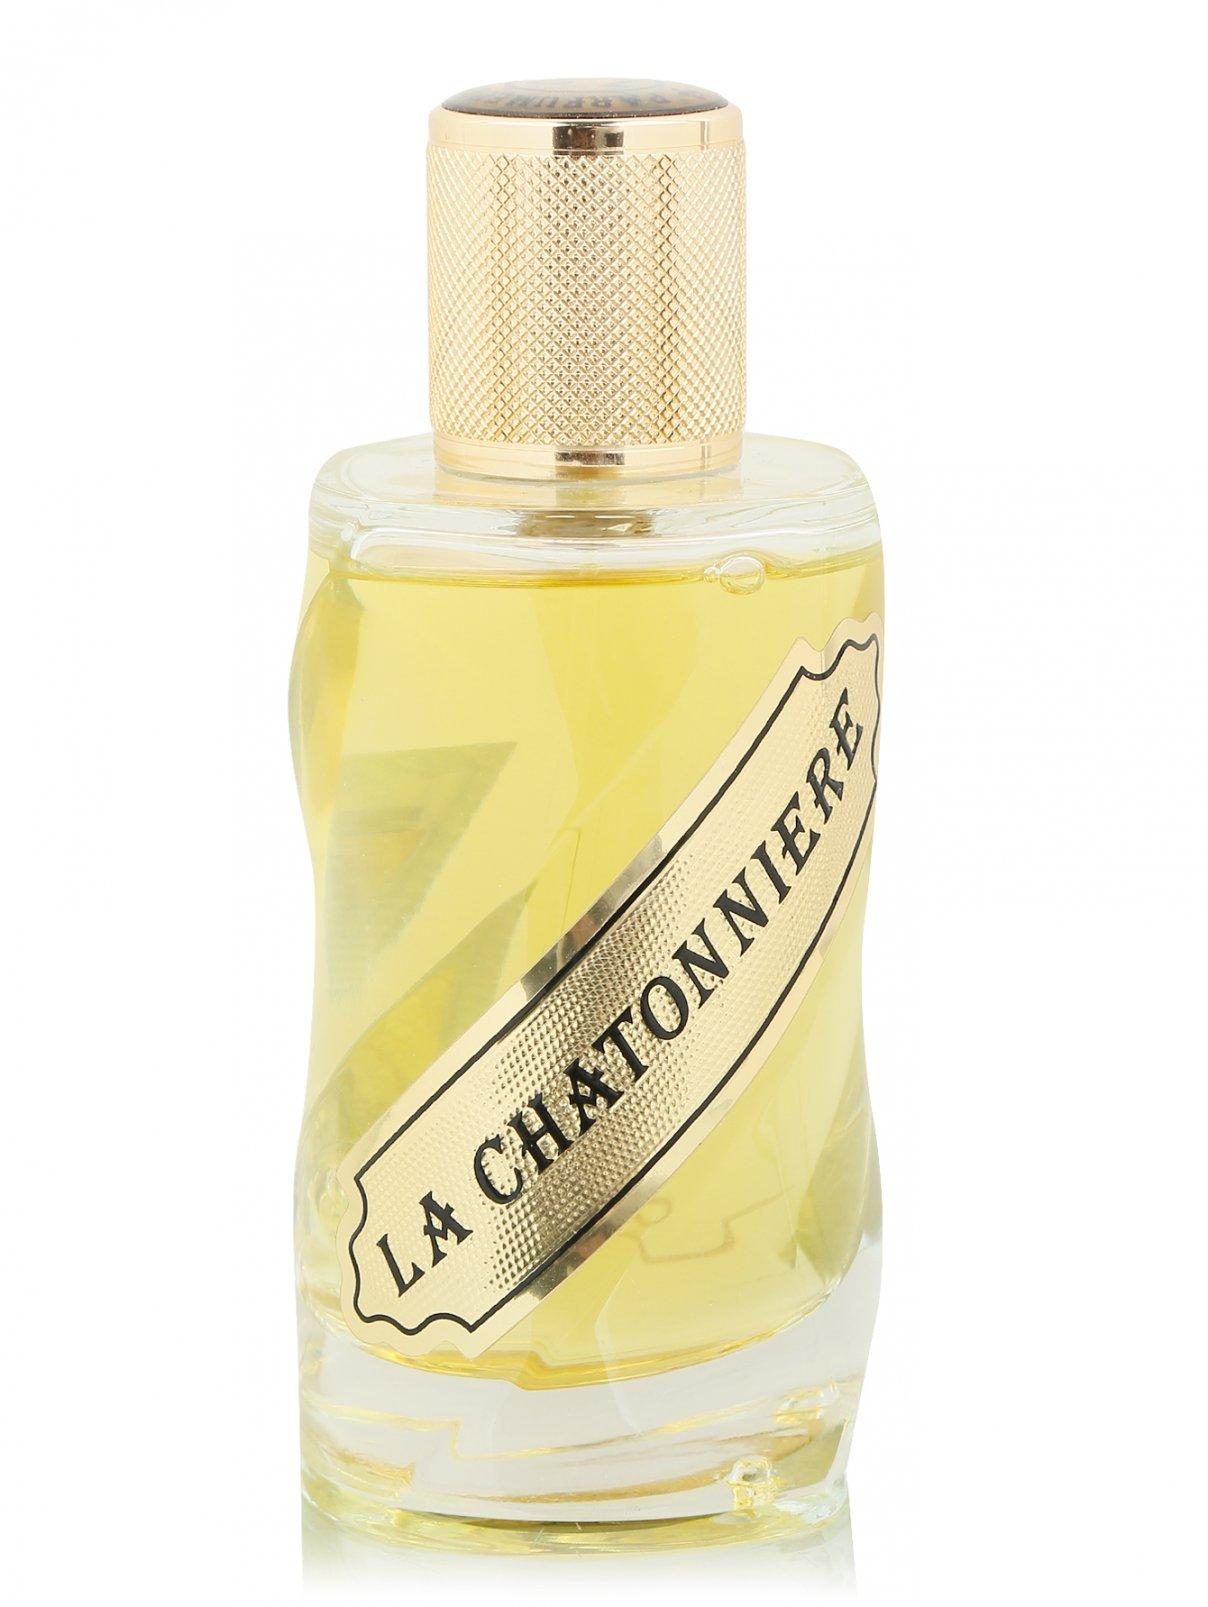 Парфюмерная вода 100 мл LA CHATONNIERE Royal Jardins 12 Parfumeurs Francais  –  Общий вид